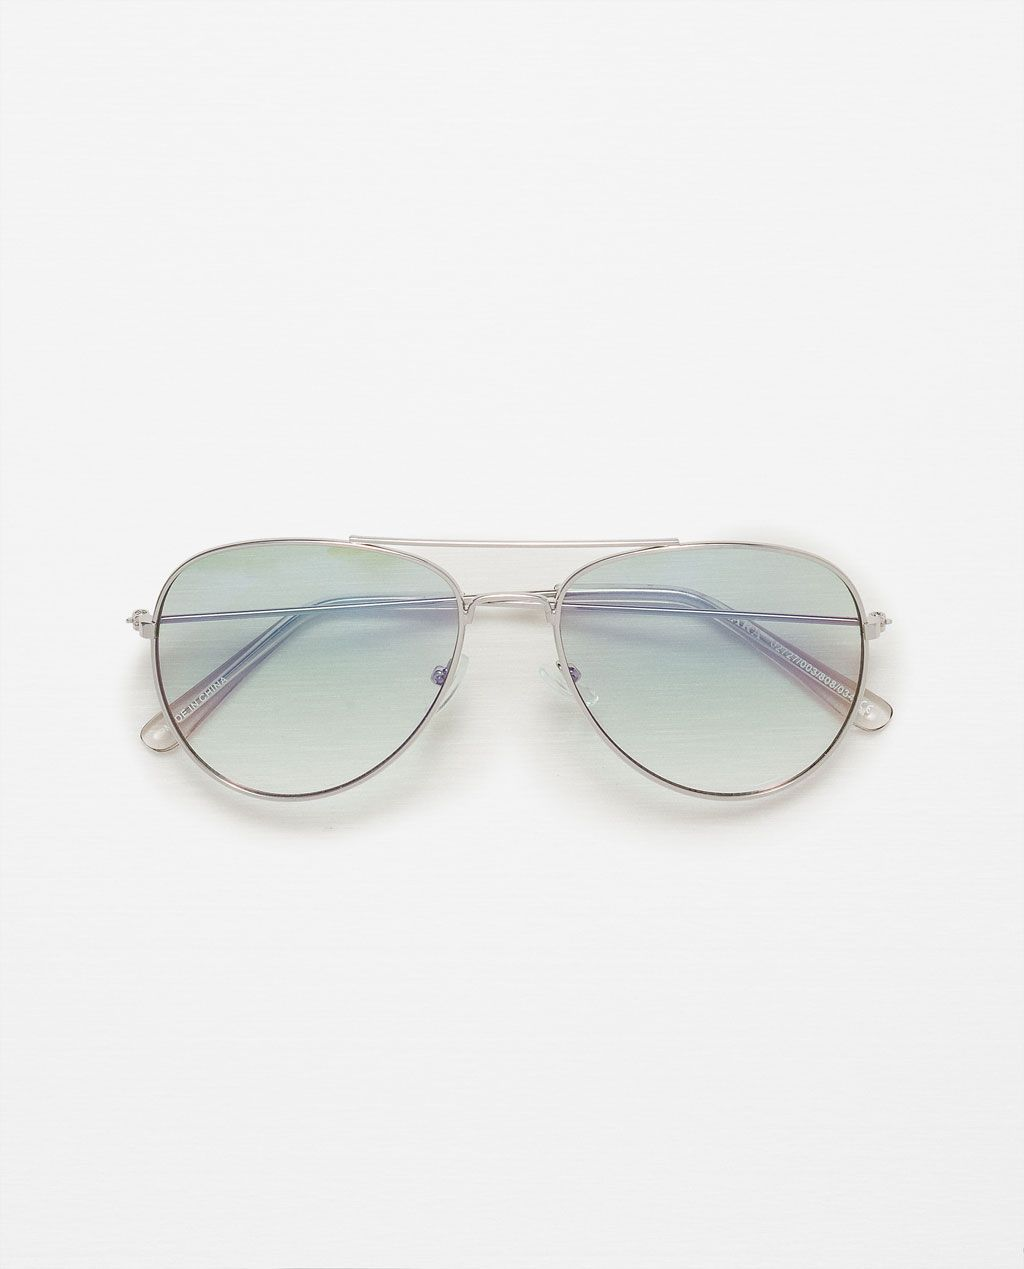 57861df707 lunette de soleil zara femme